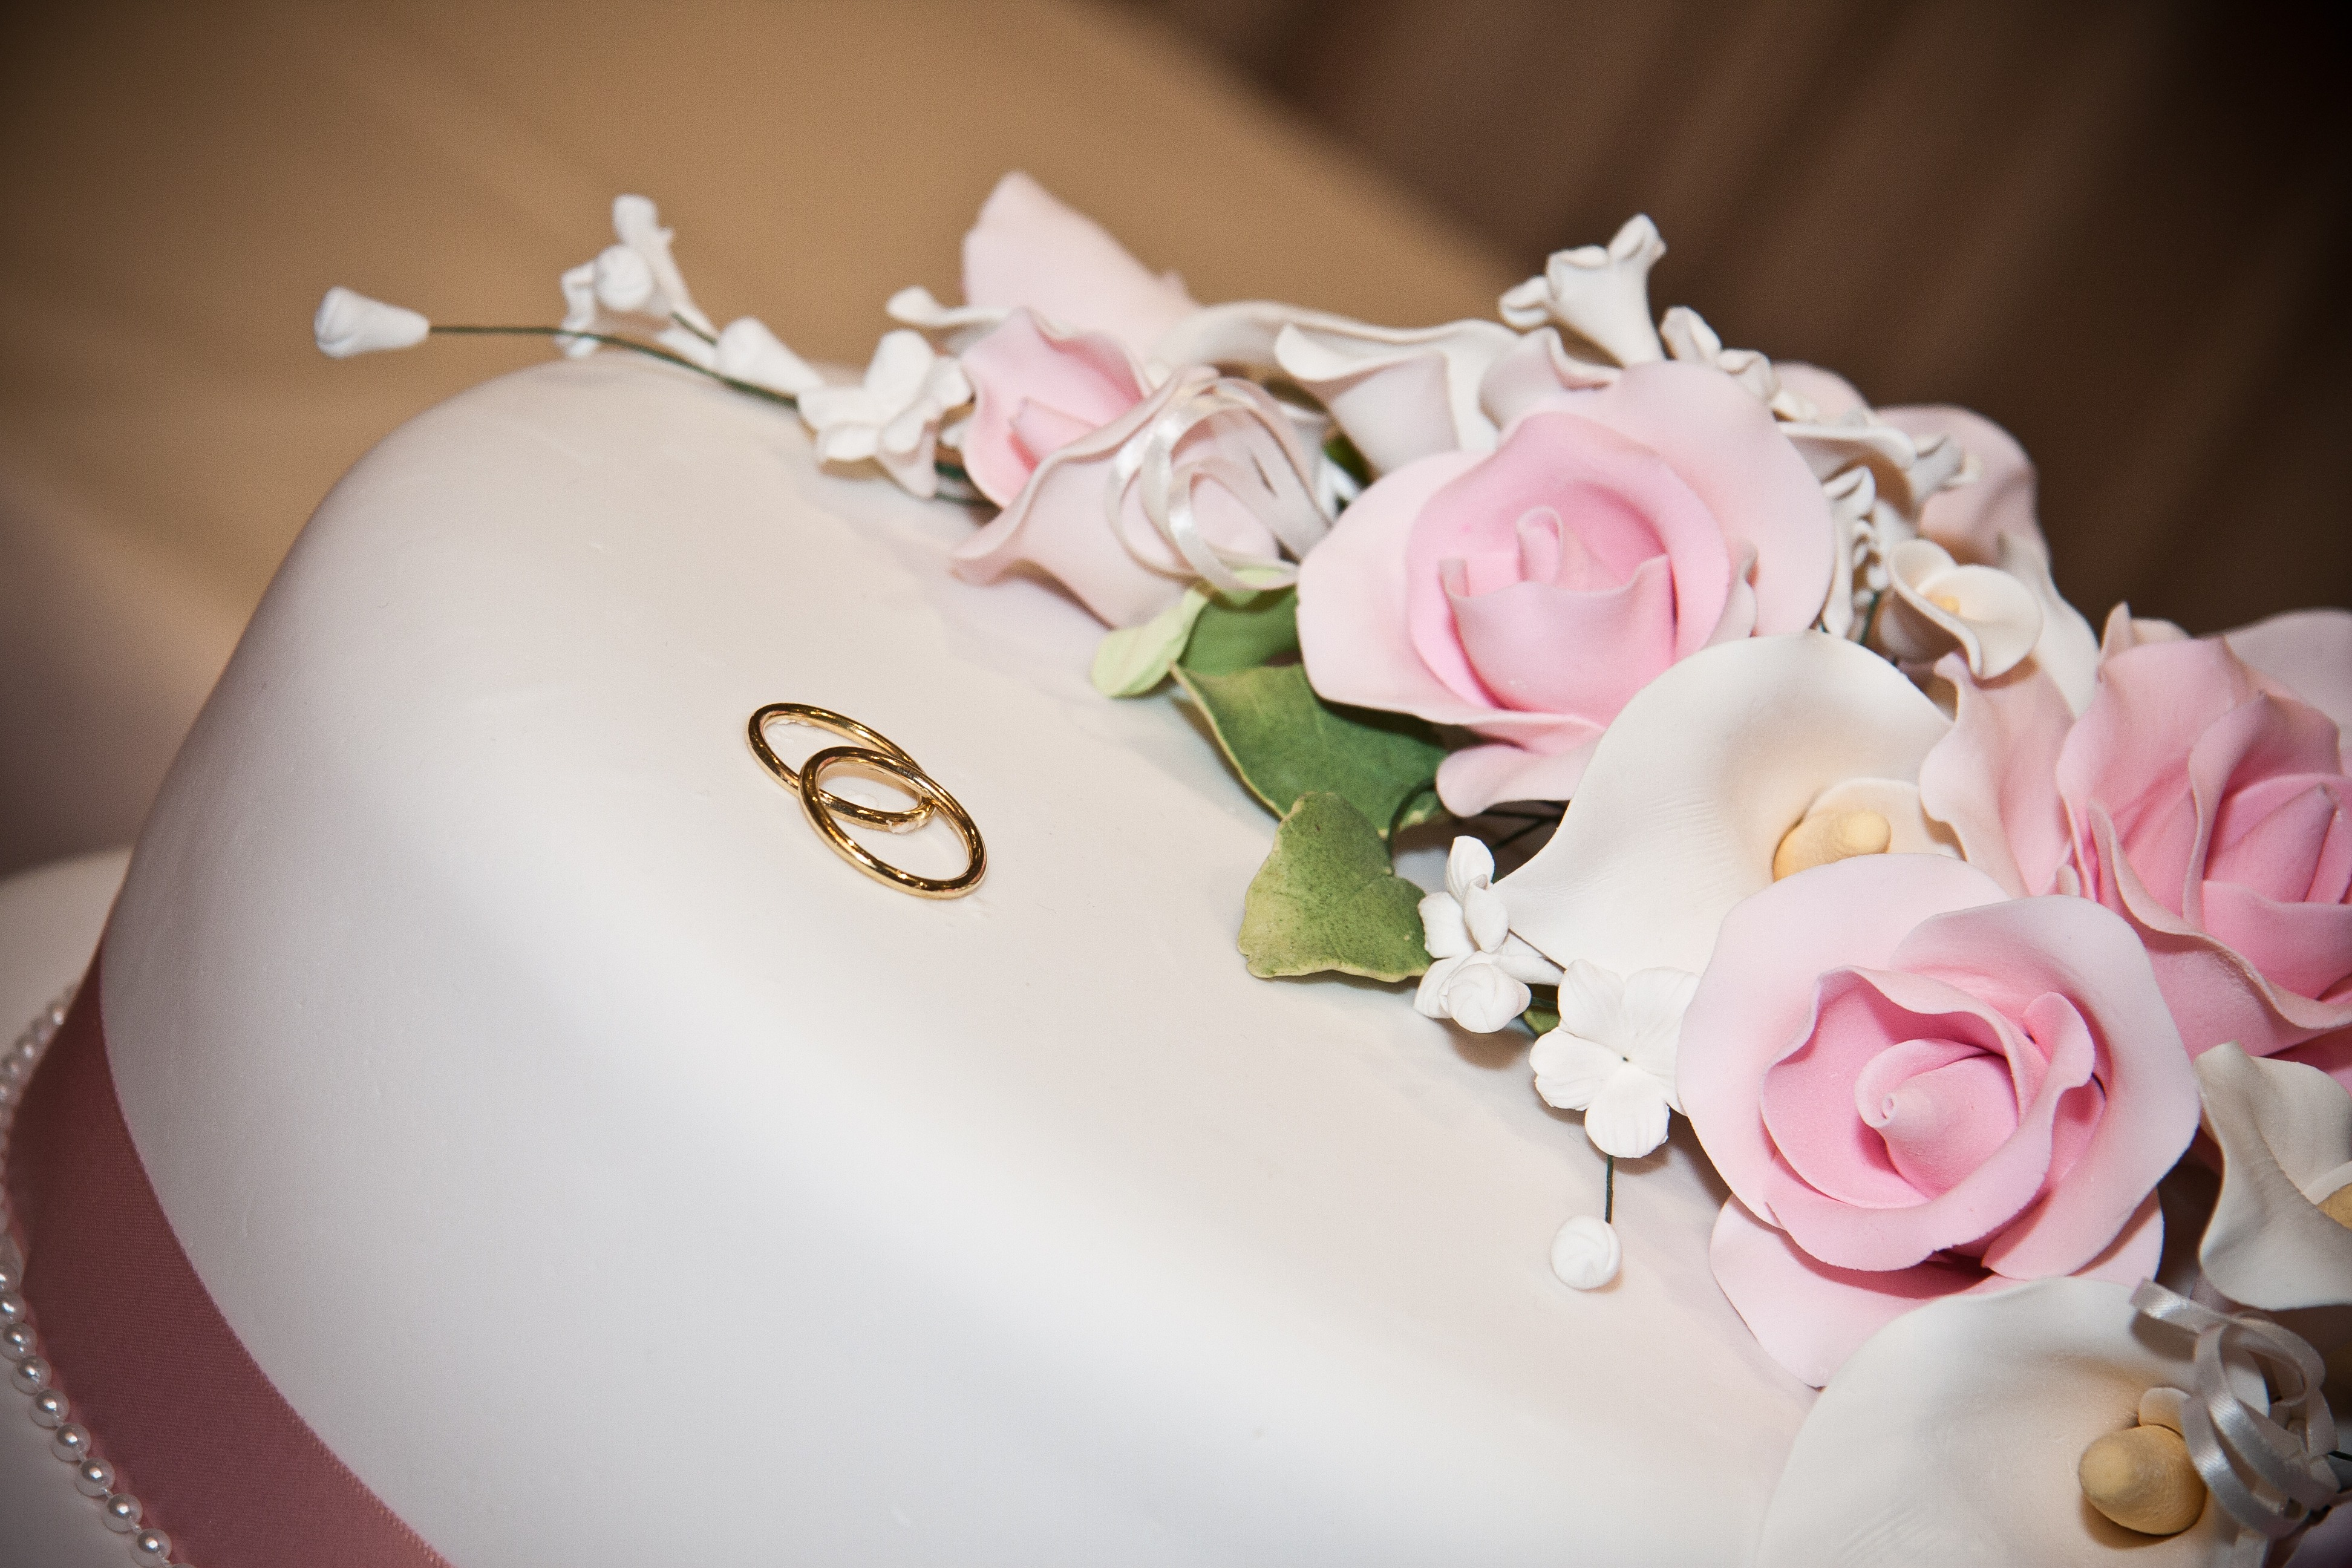 wedding_cake_192520